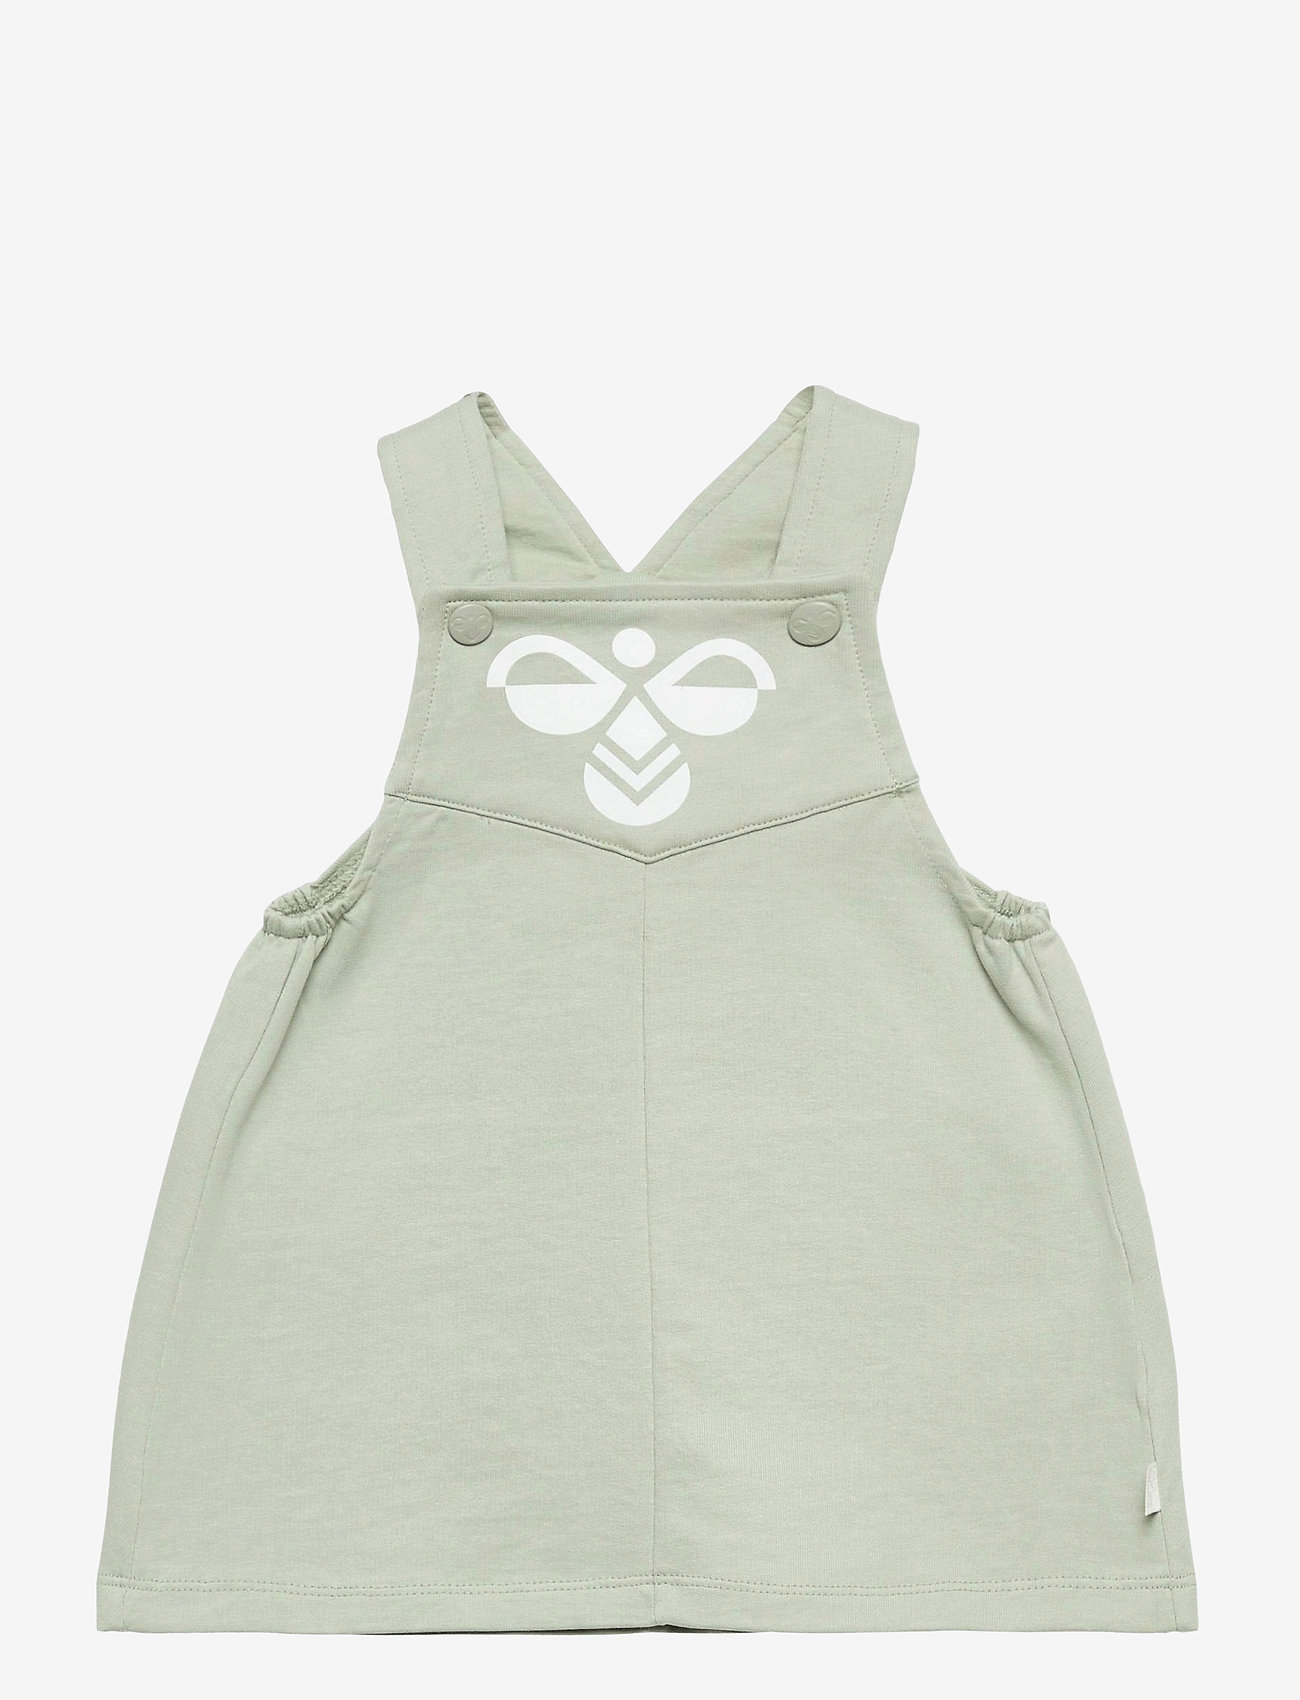 Hummel - hmlELLEN DRESS - kleider - desert sage - 0